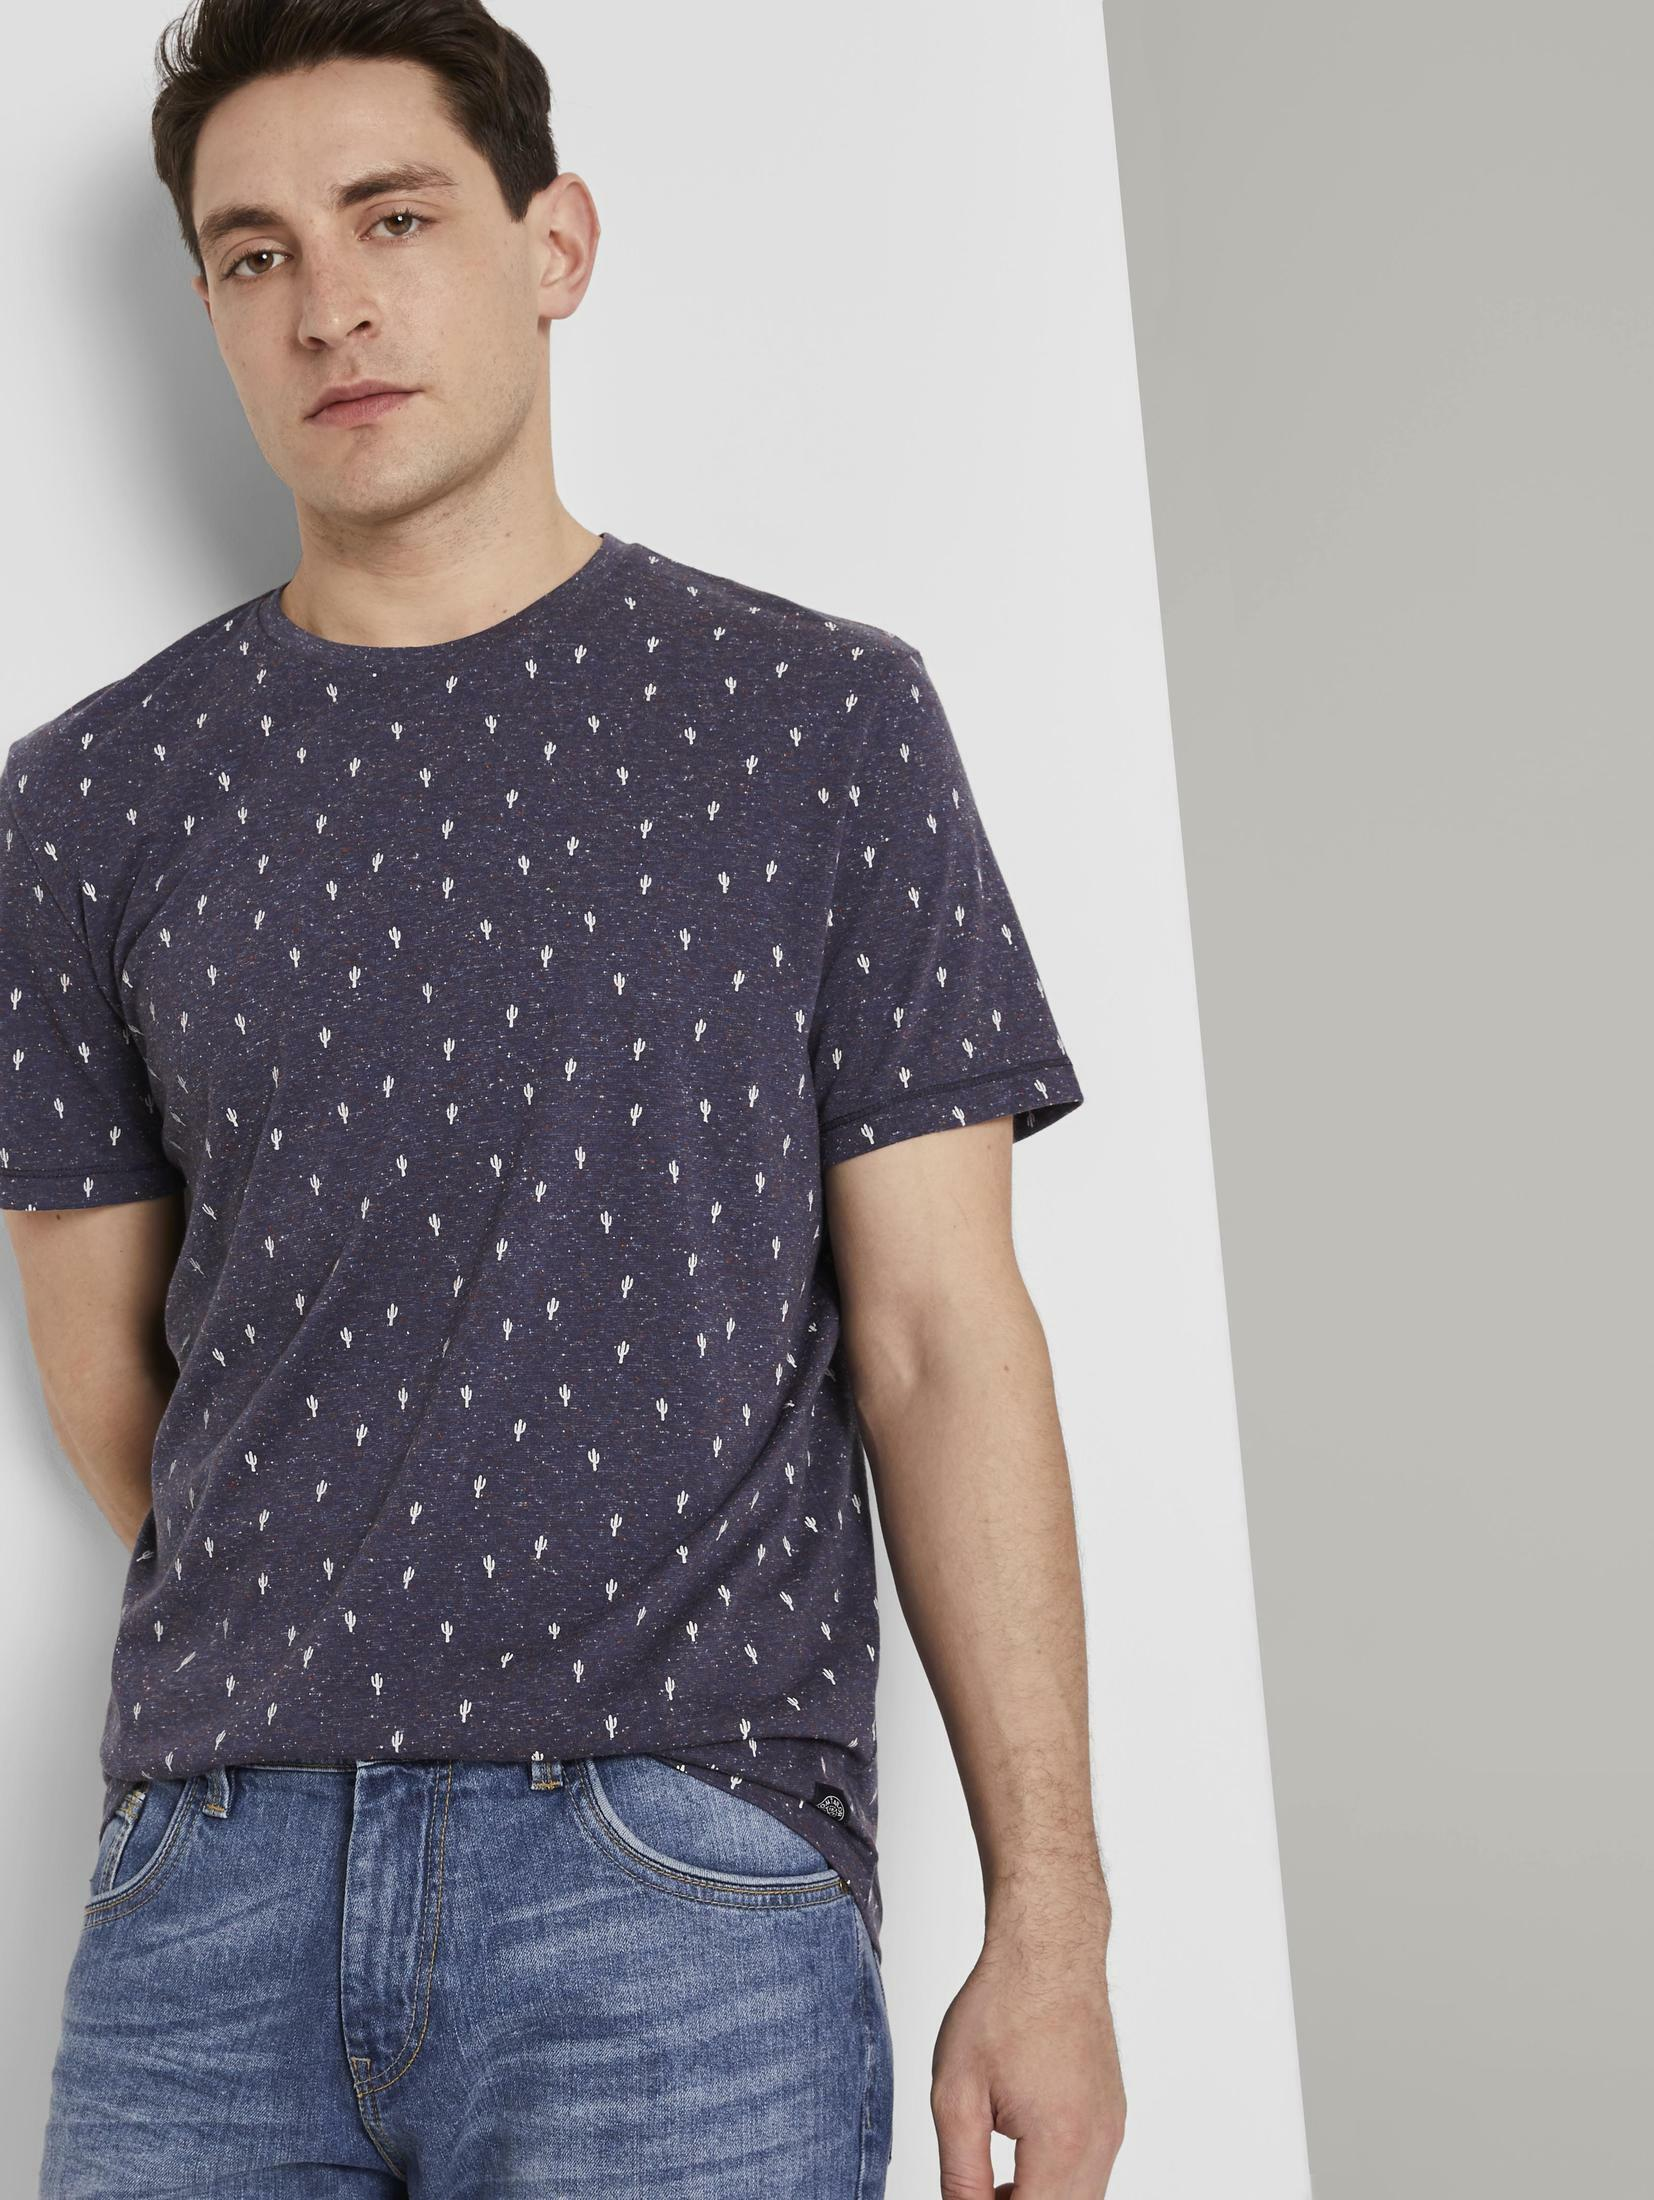 tom tailor -  T-Shirt Mehrfarbiges T-Shirt mit Allover-Print